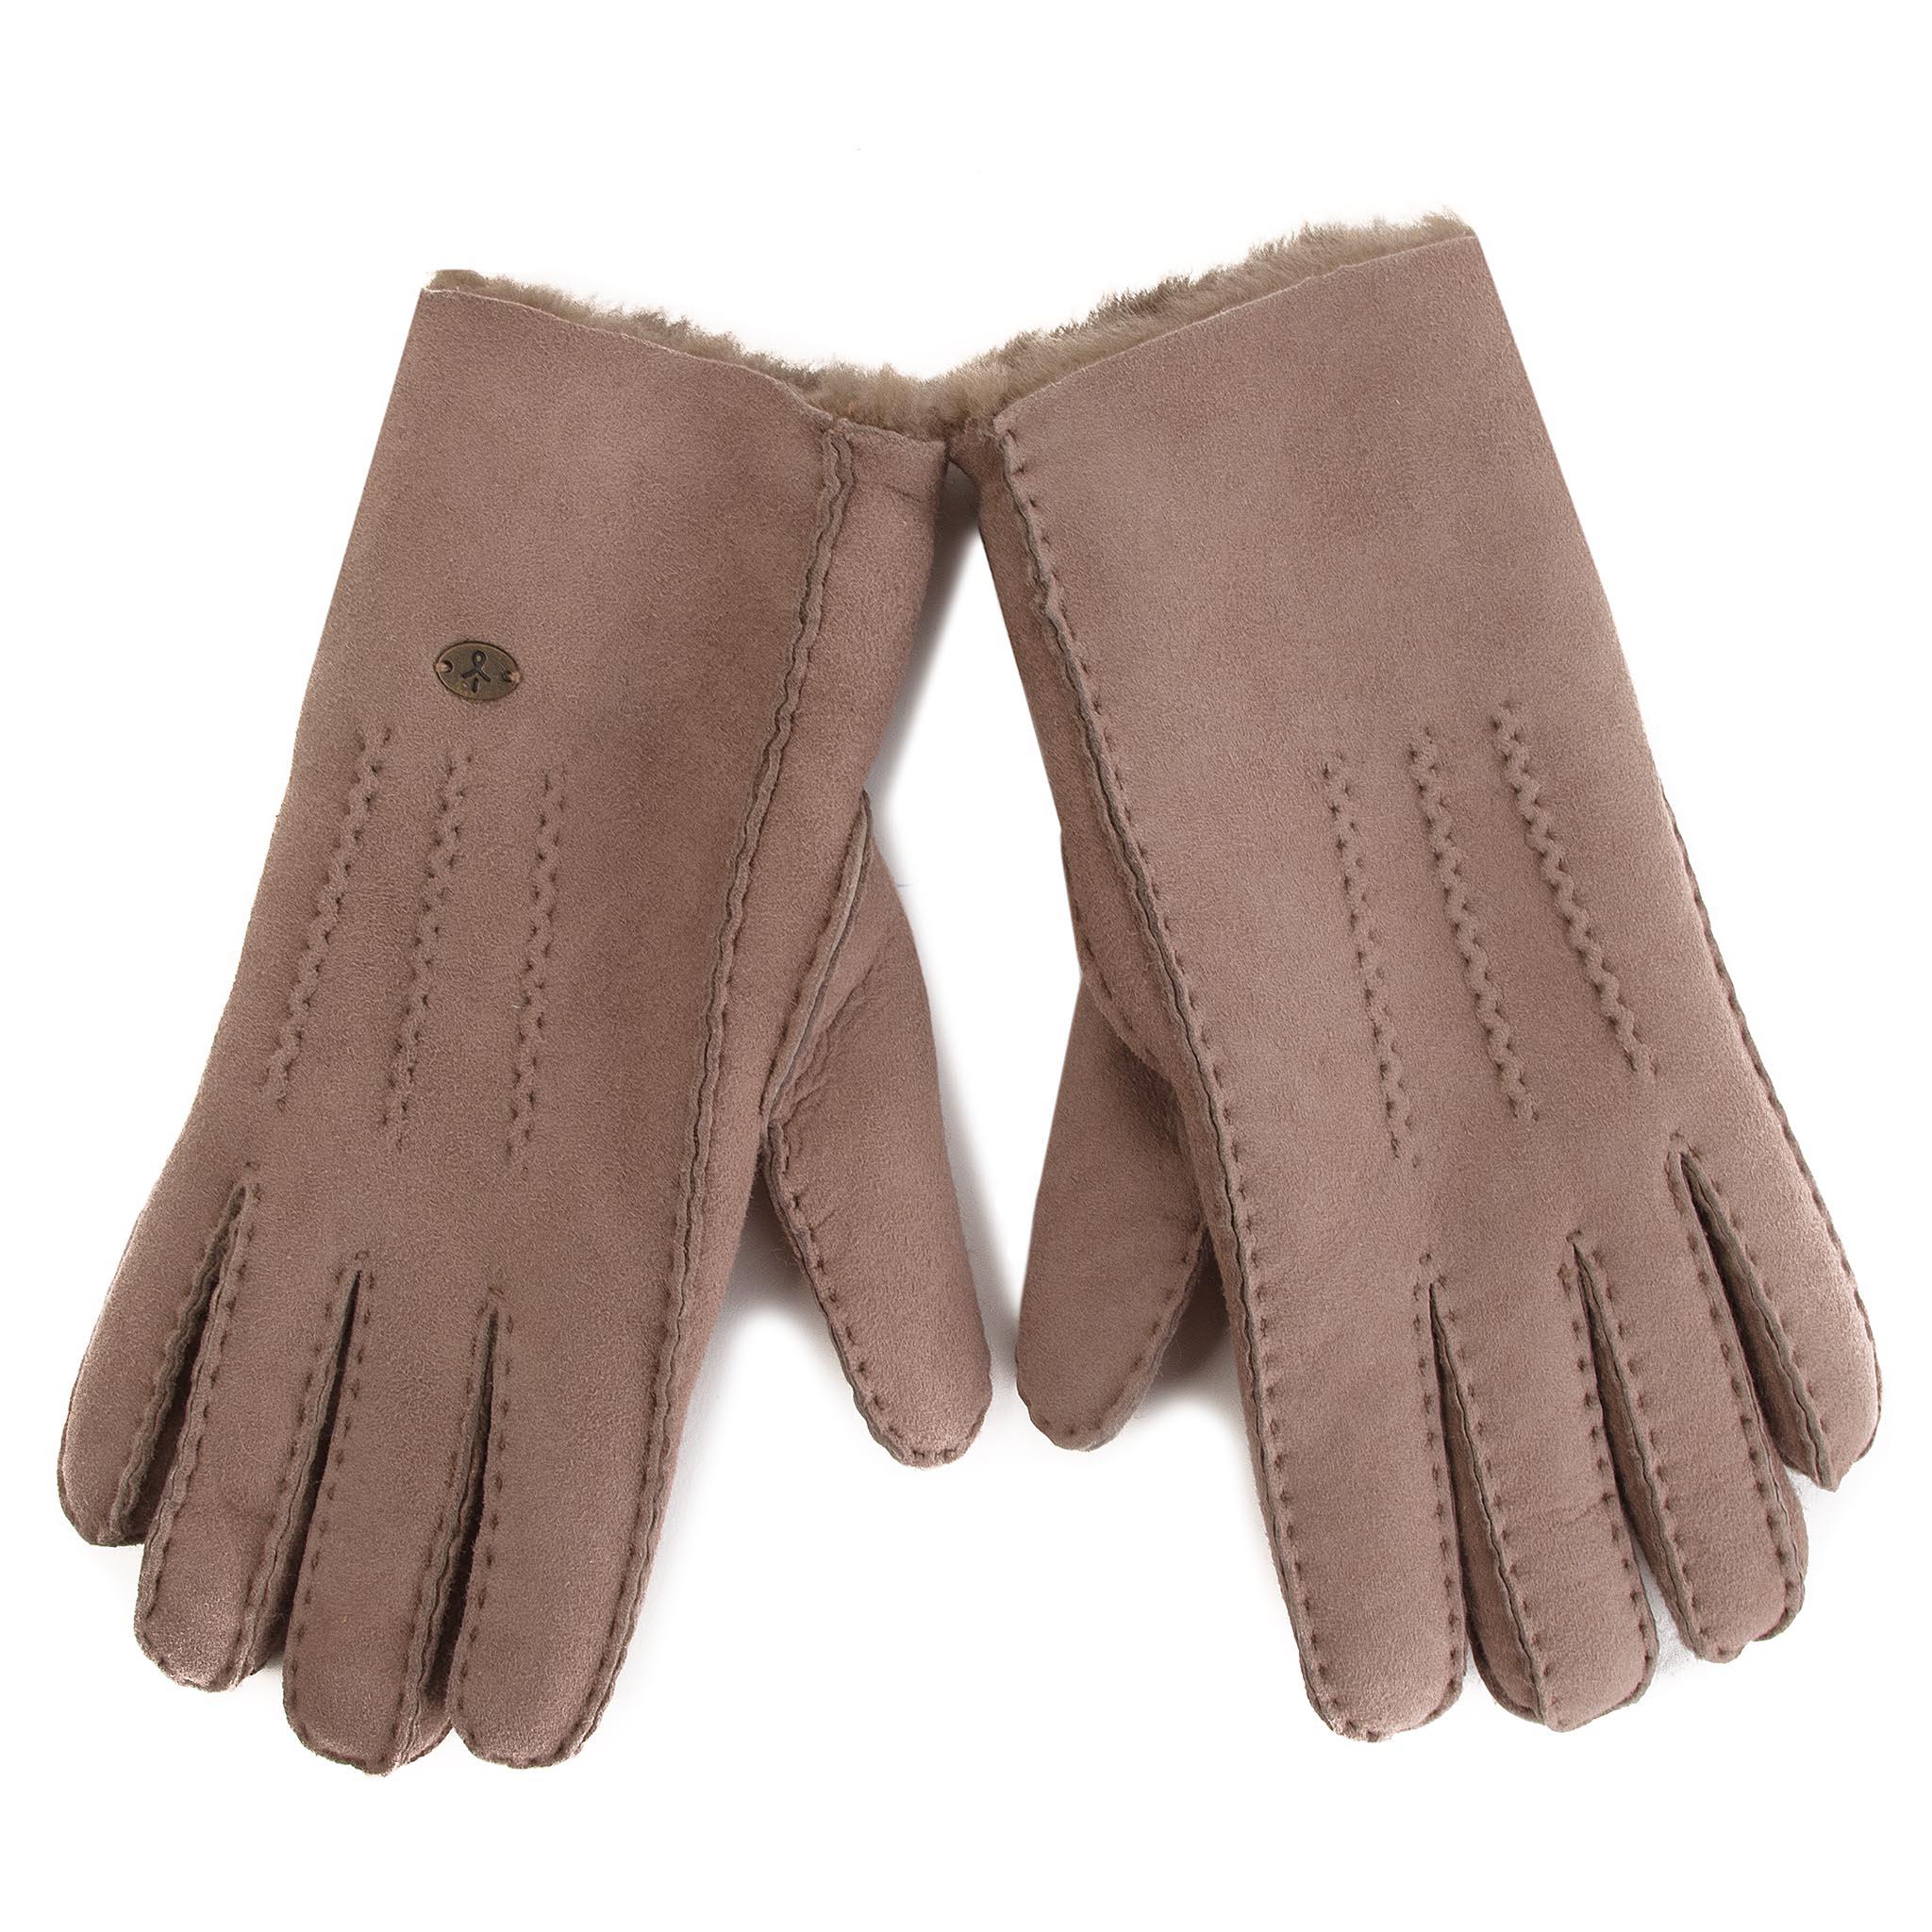 Image of Damenhandschuhe EMU AUSTRALIA - Beech Forest Gloves Mushroom 1